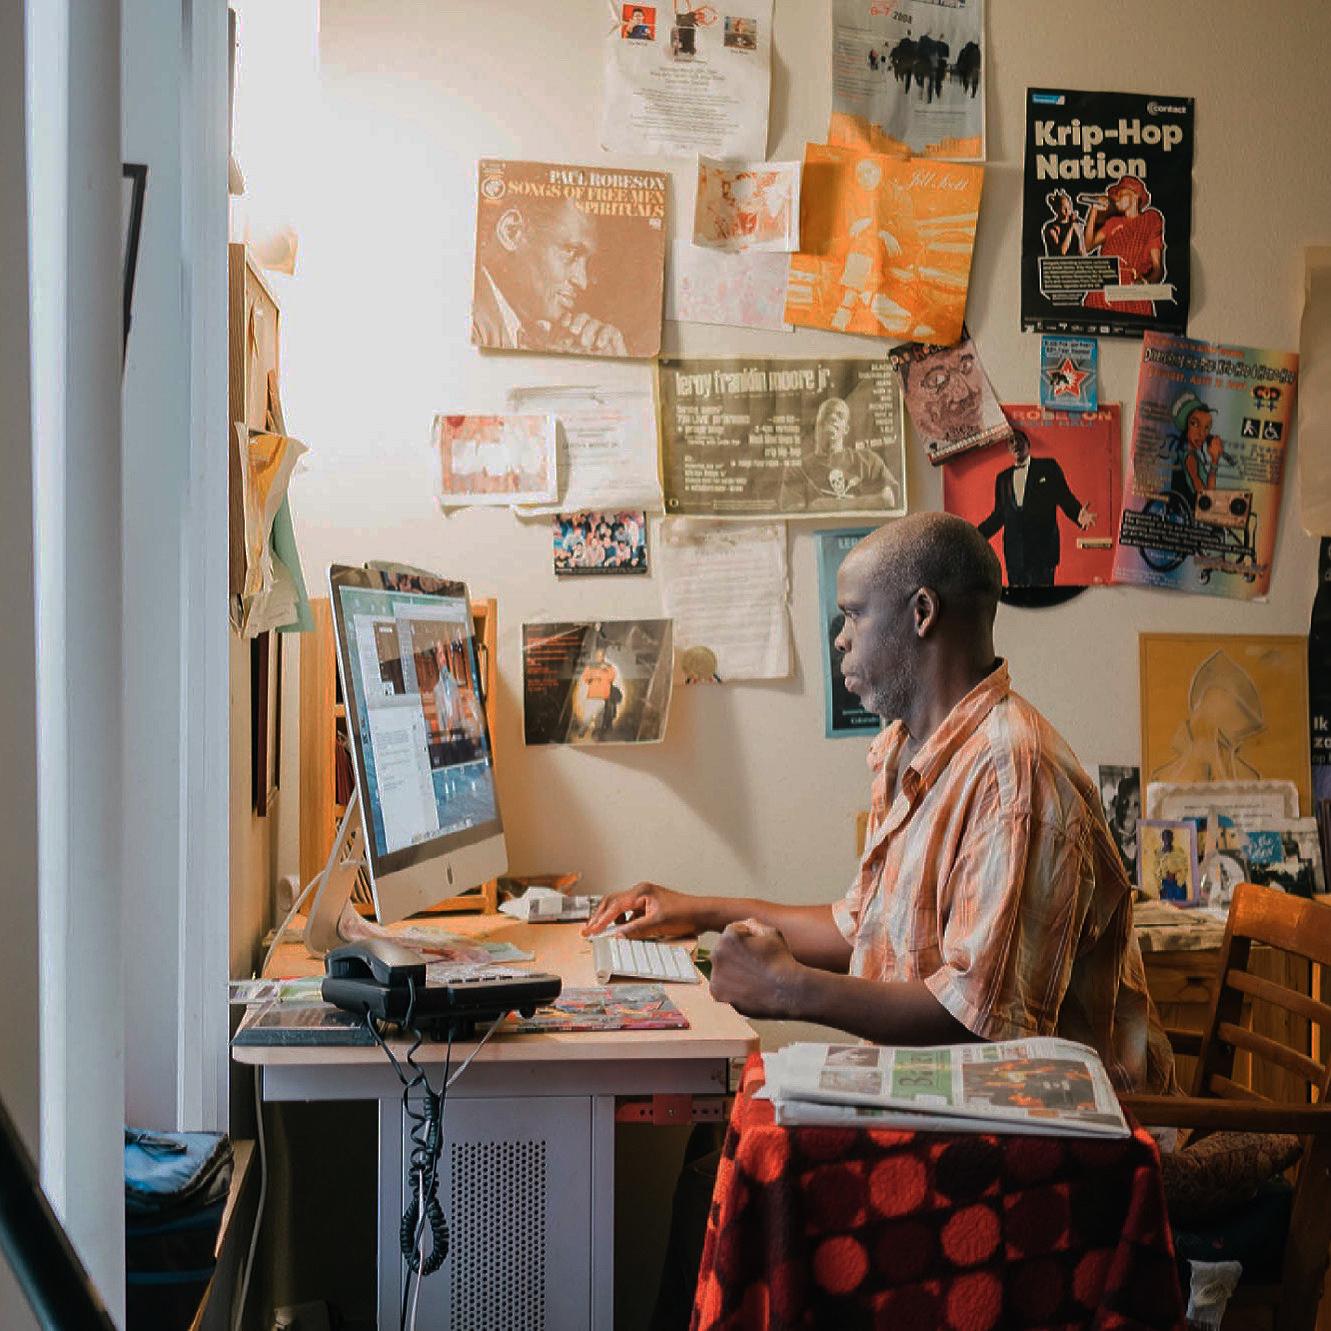 Leroy-Moore-at-computer, Leroy Moore: Dear Black community, Culture Currents